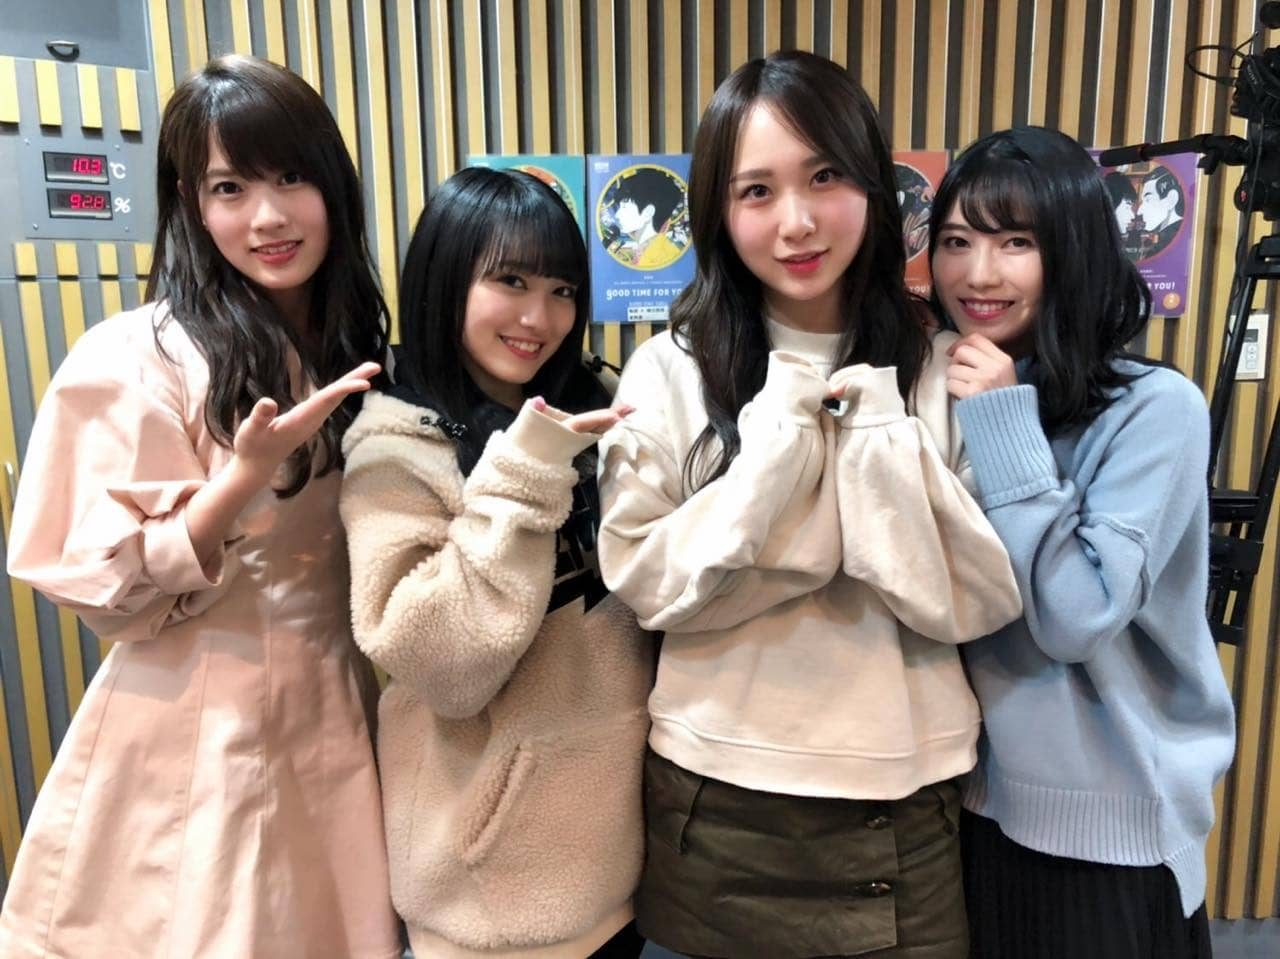 AKB48 高橋朱里・横山由依・向井地美音・岡部麟「AKB48のオールナイトニッポン」オフショット